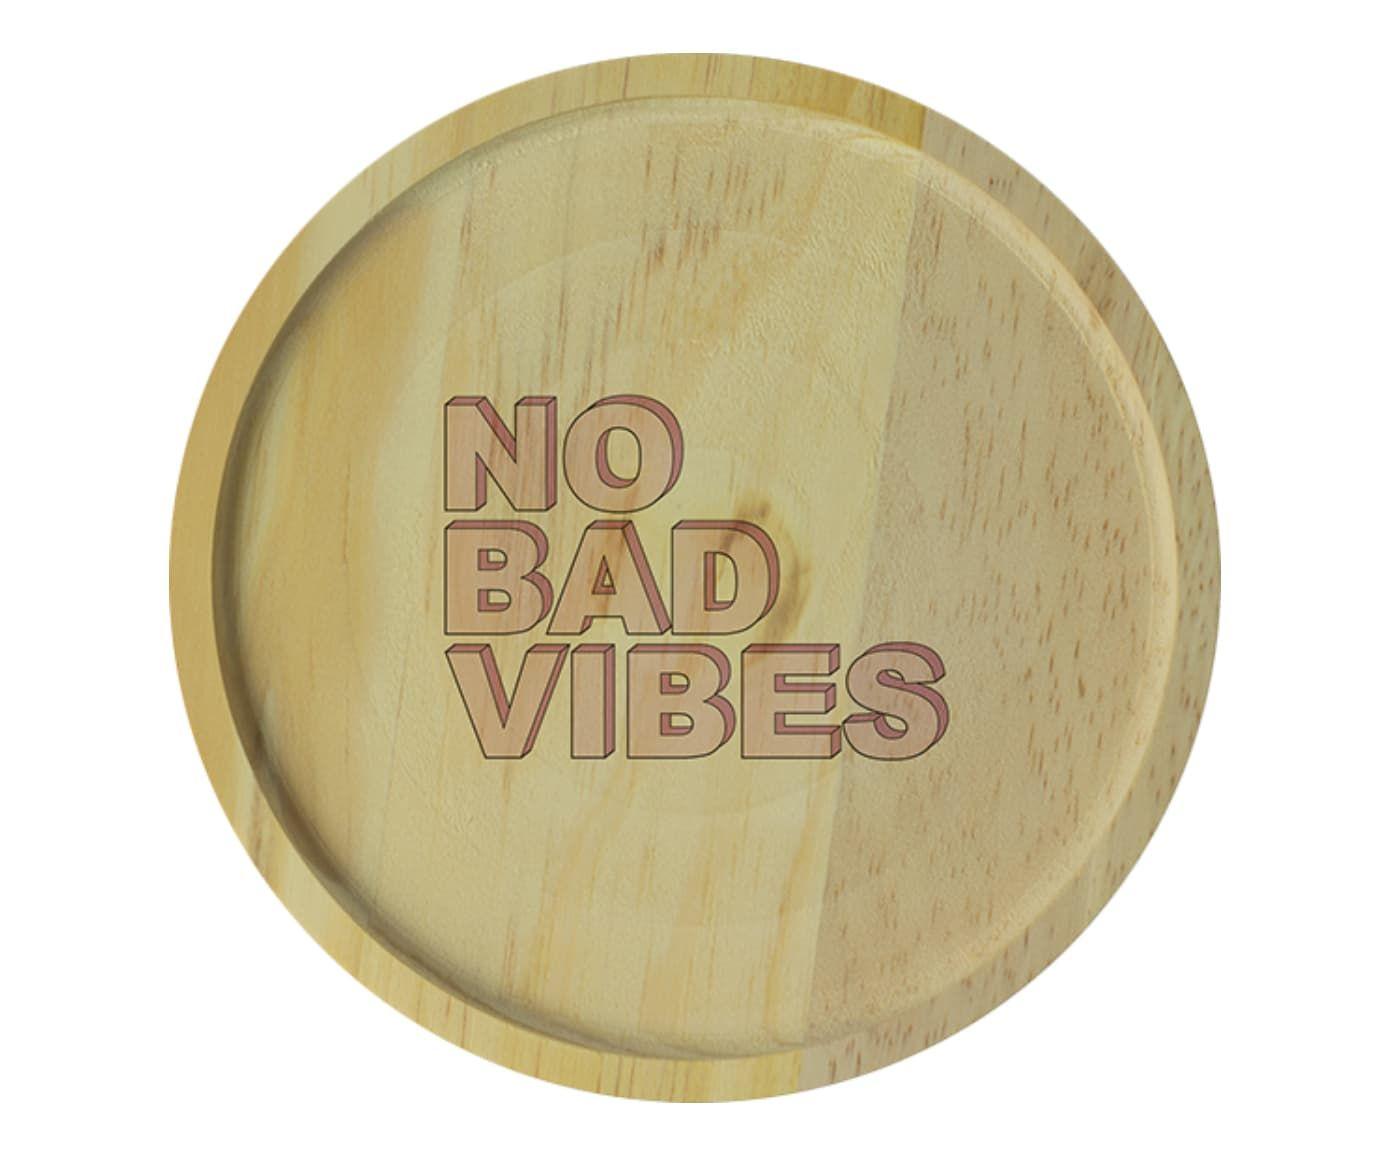 Prato para Joias No Bad Vibes - 14,5cm | Westwing.com.br